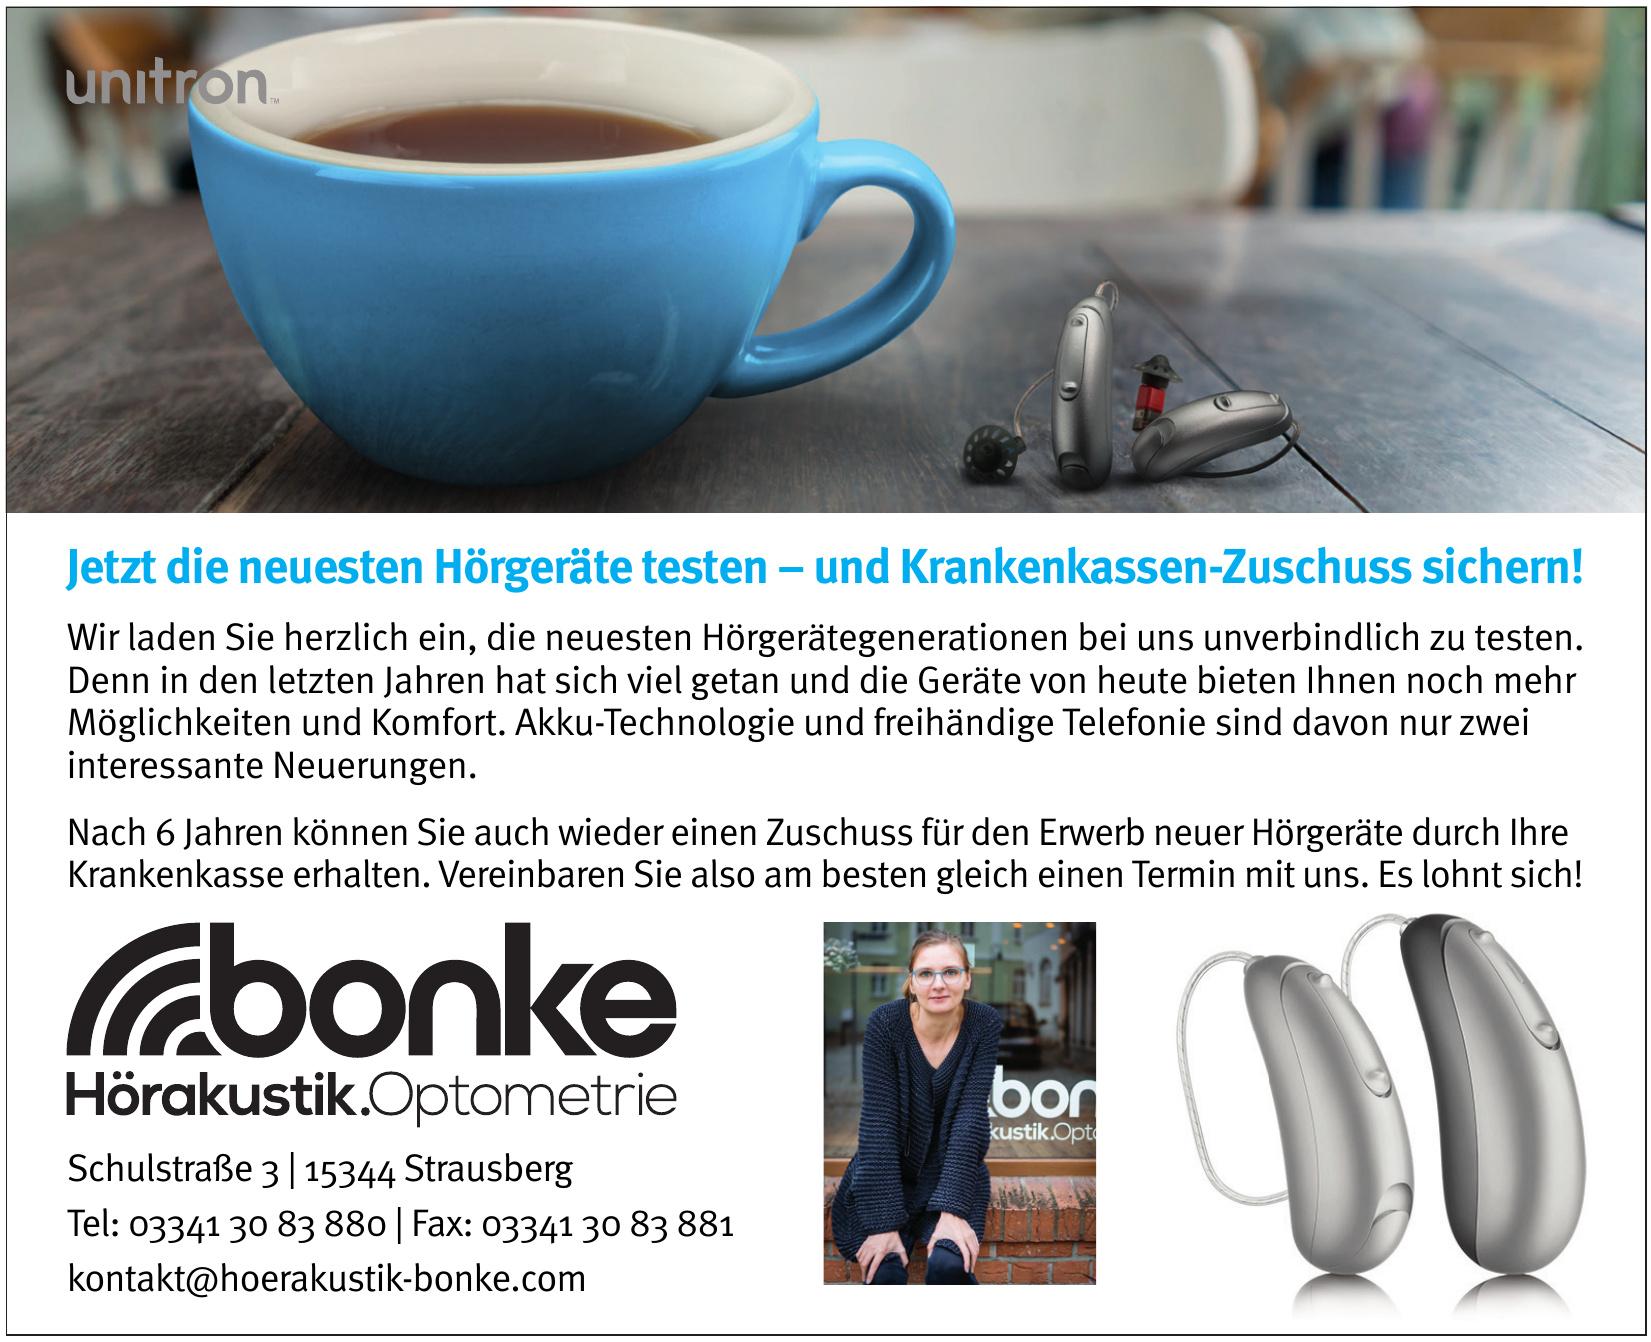 Bonke Hörakustik - Optometrie